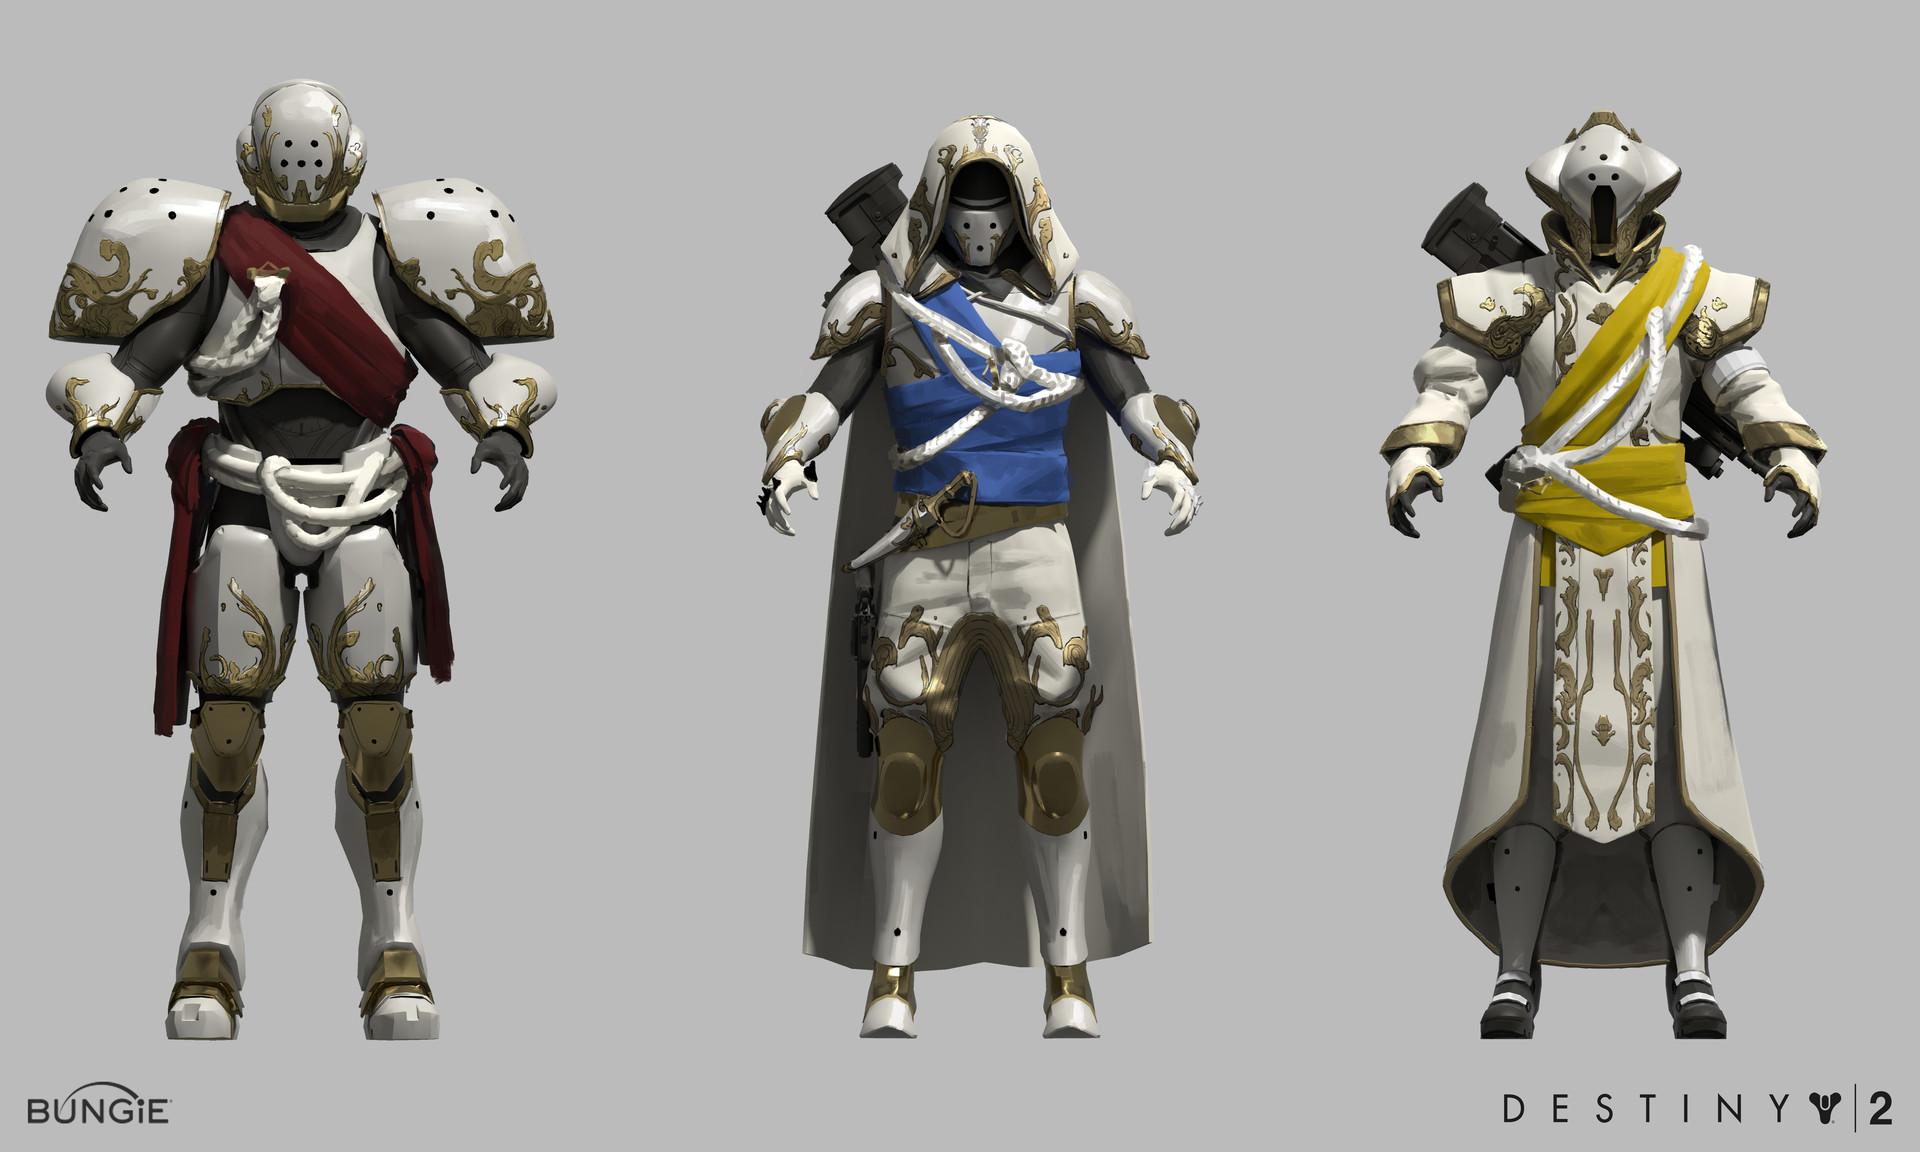 Destiny 2 Guardian Concept Art